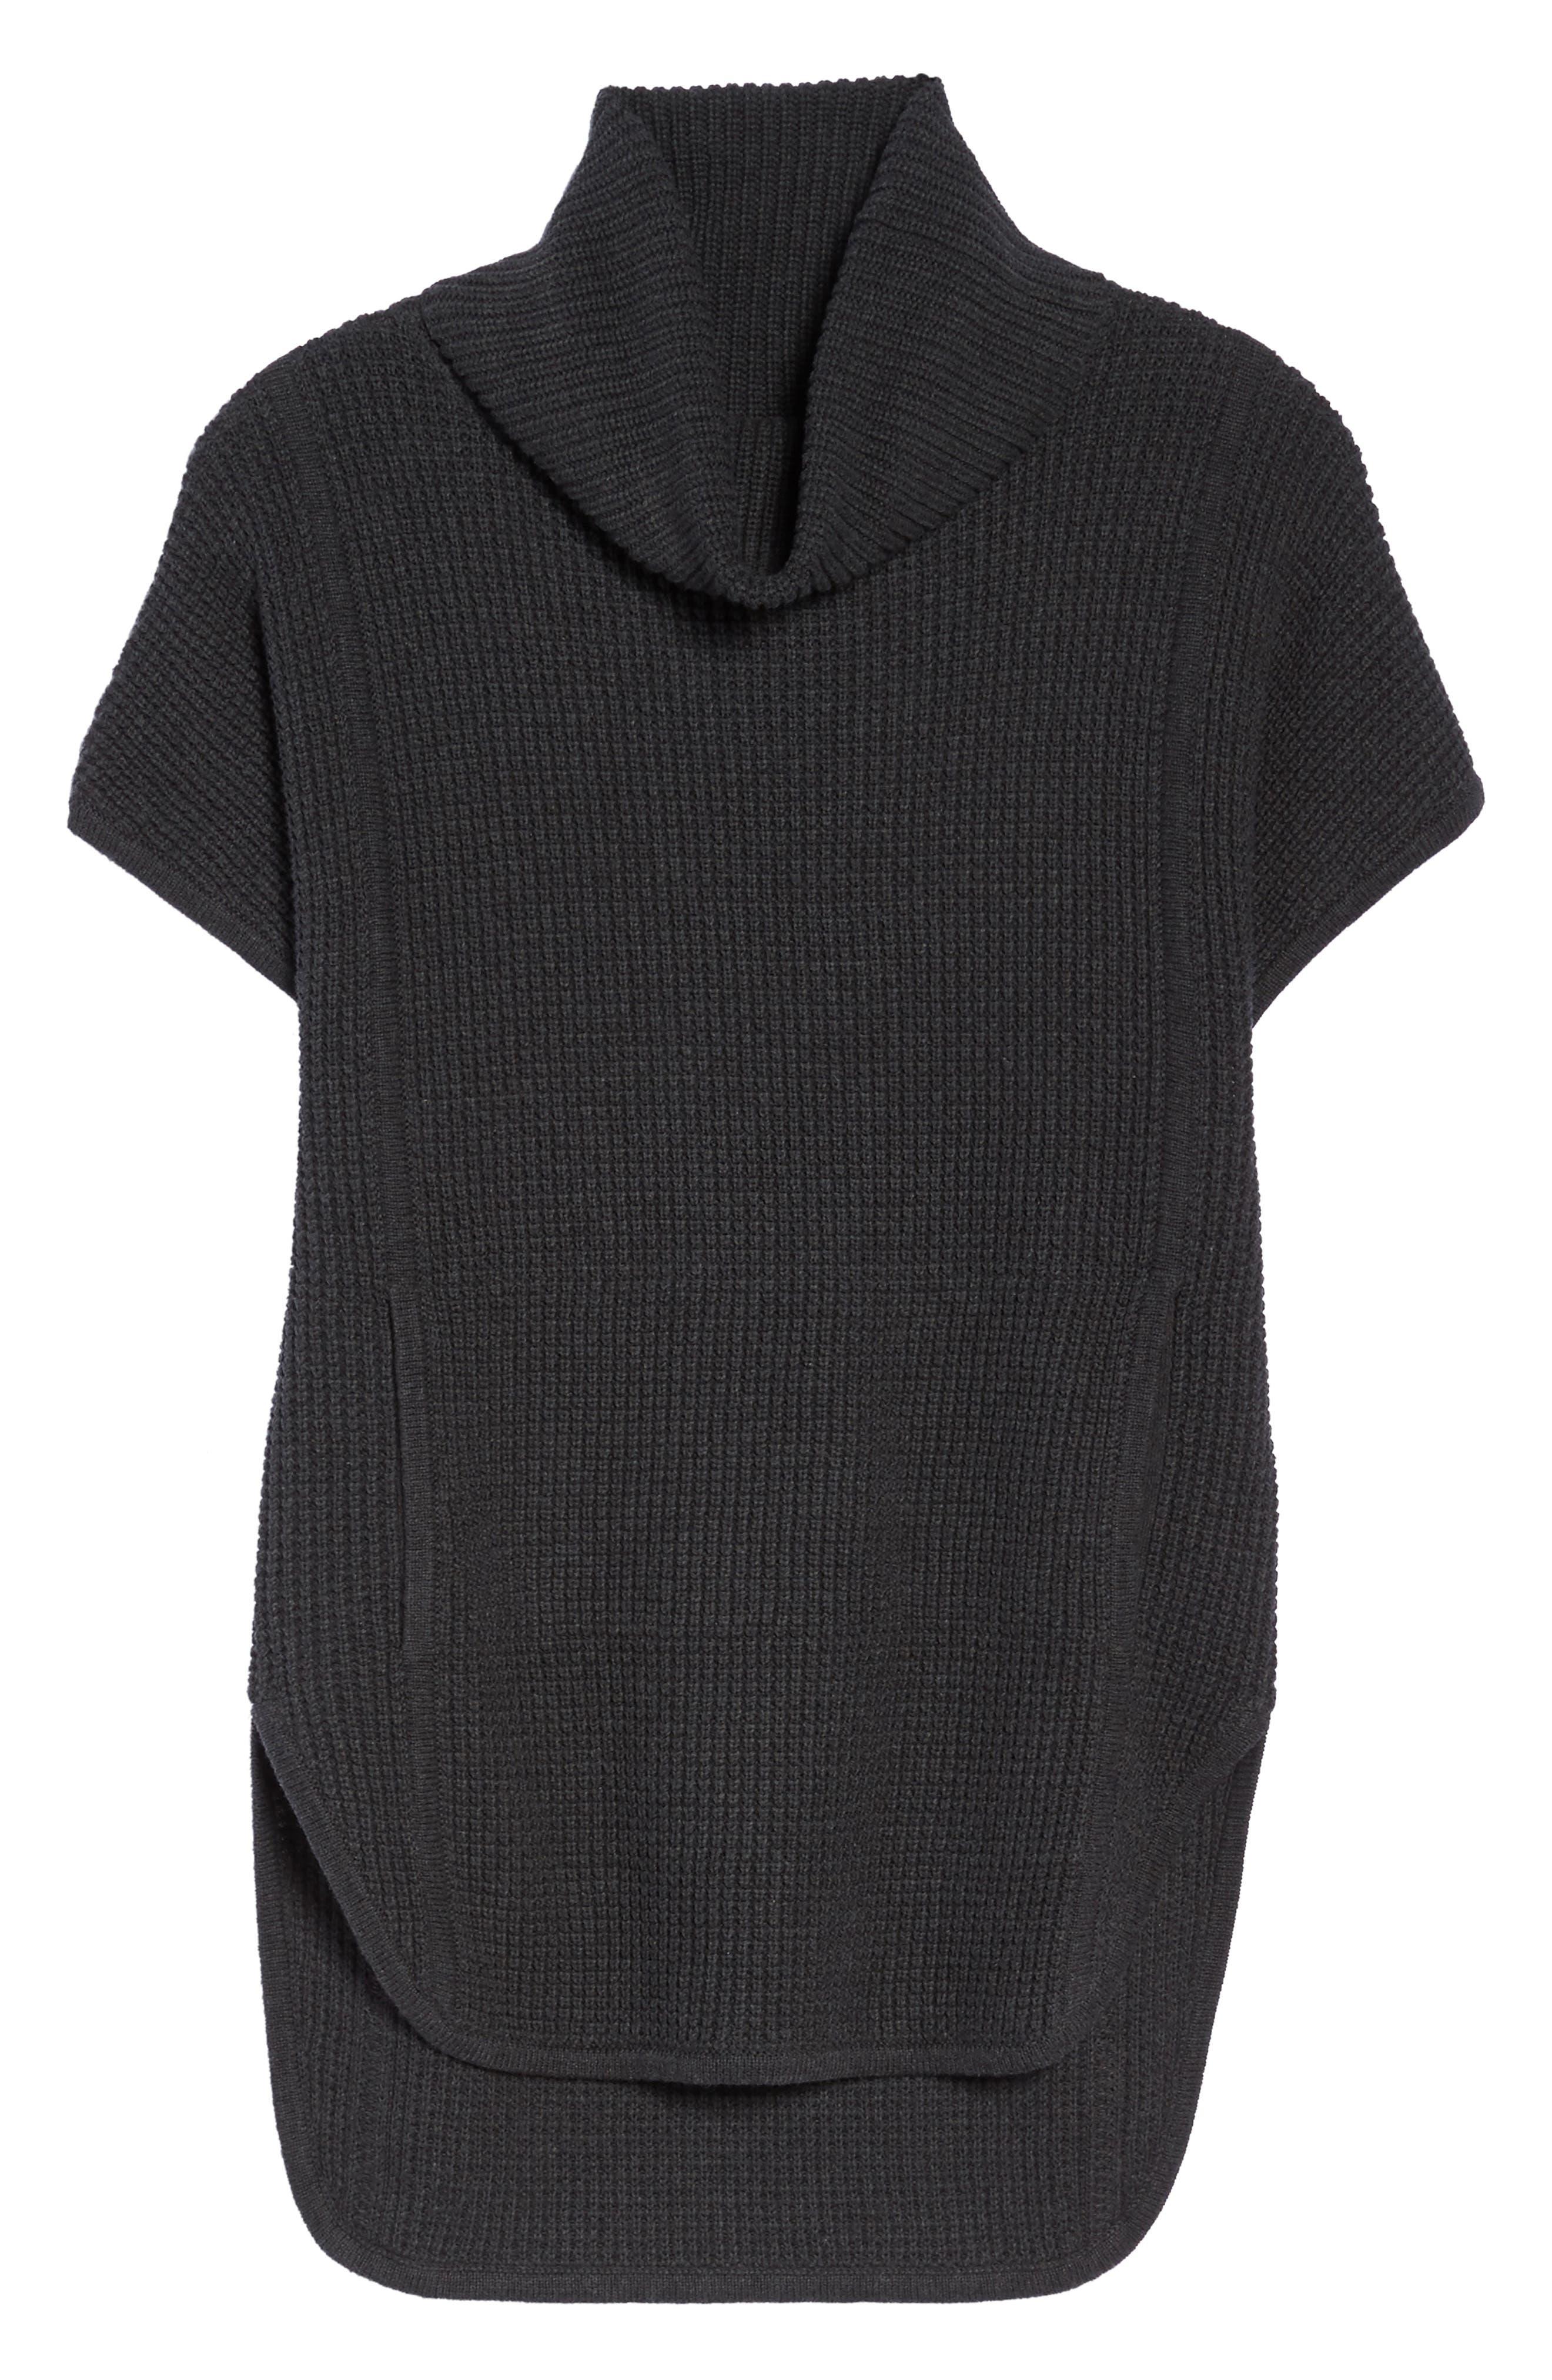 Alternate Image 4  - UGG® 'Selby' Turtleneck Cotton Knit Pullover